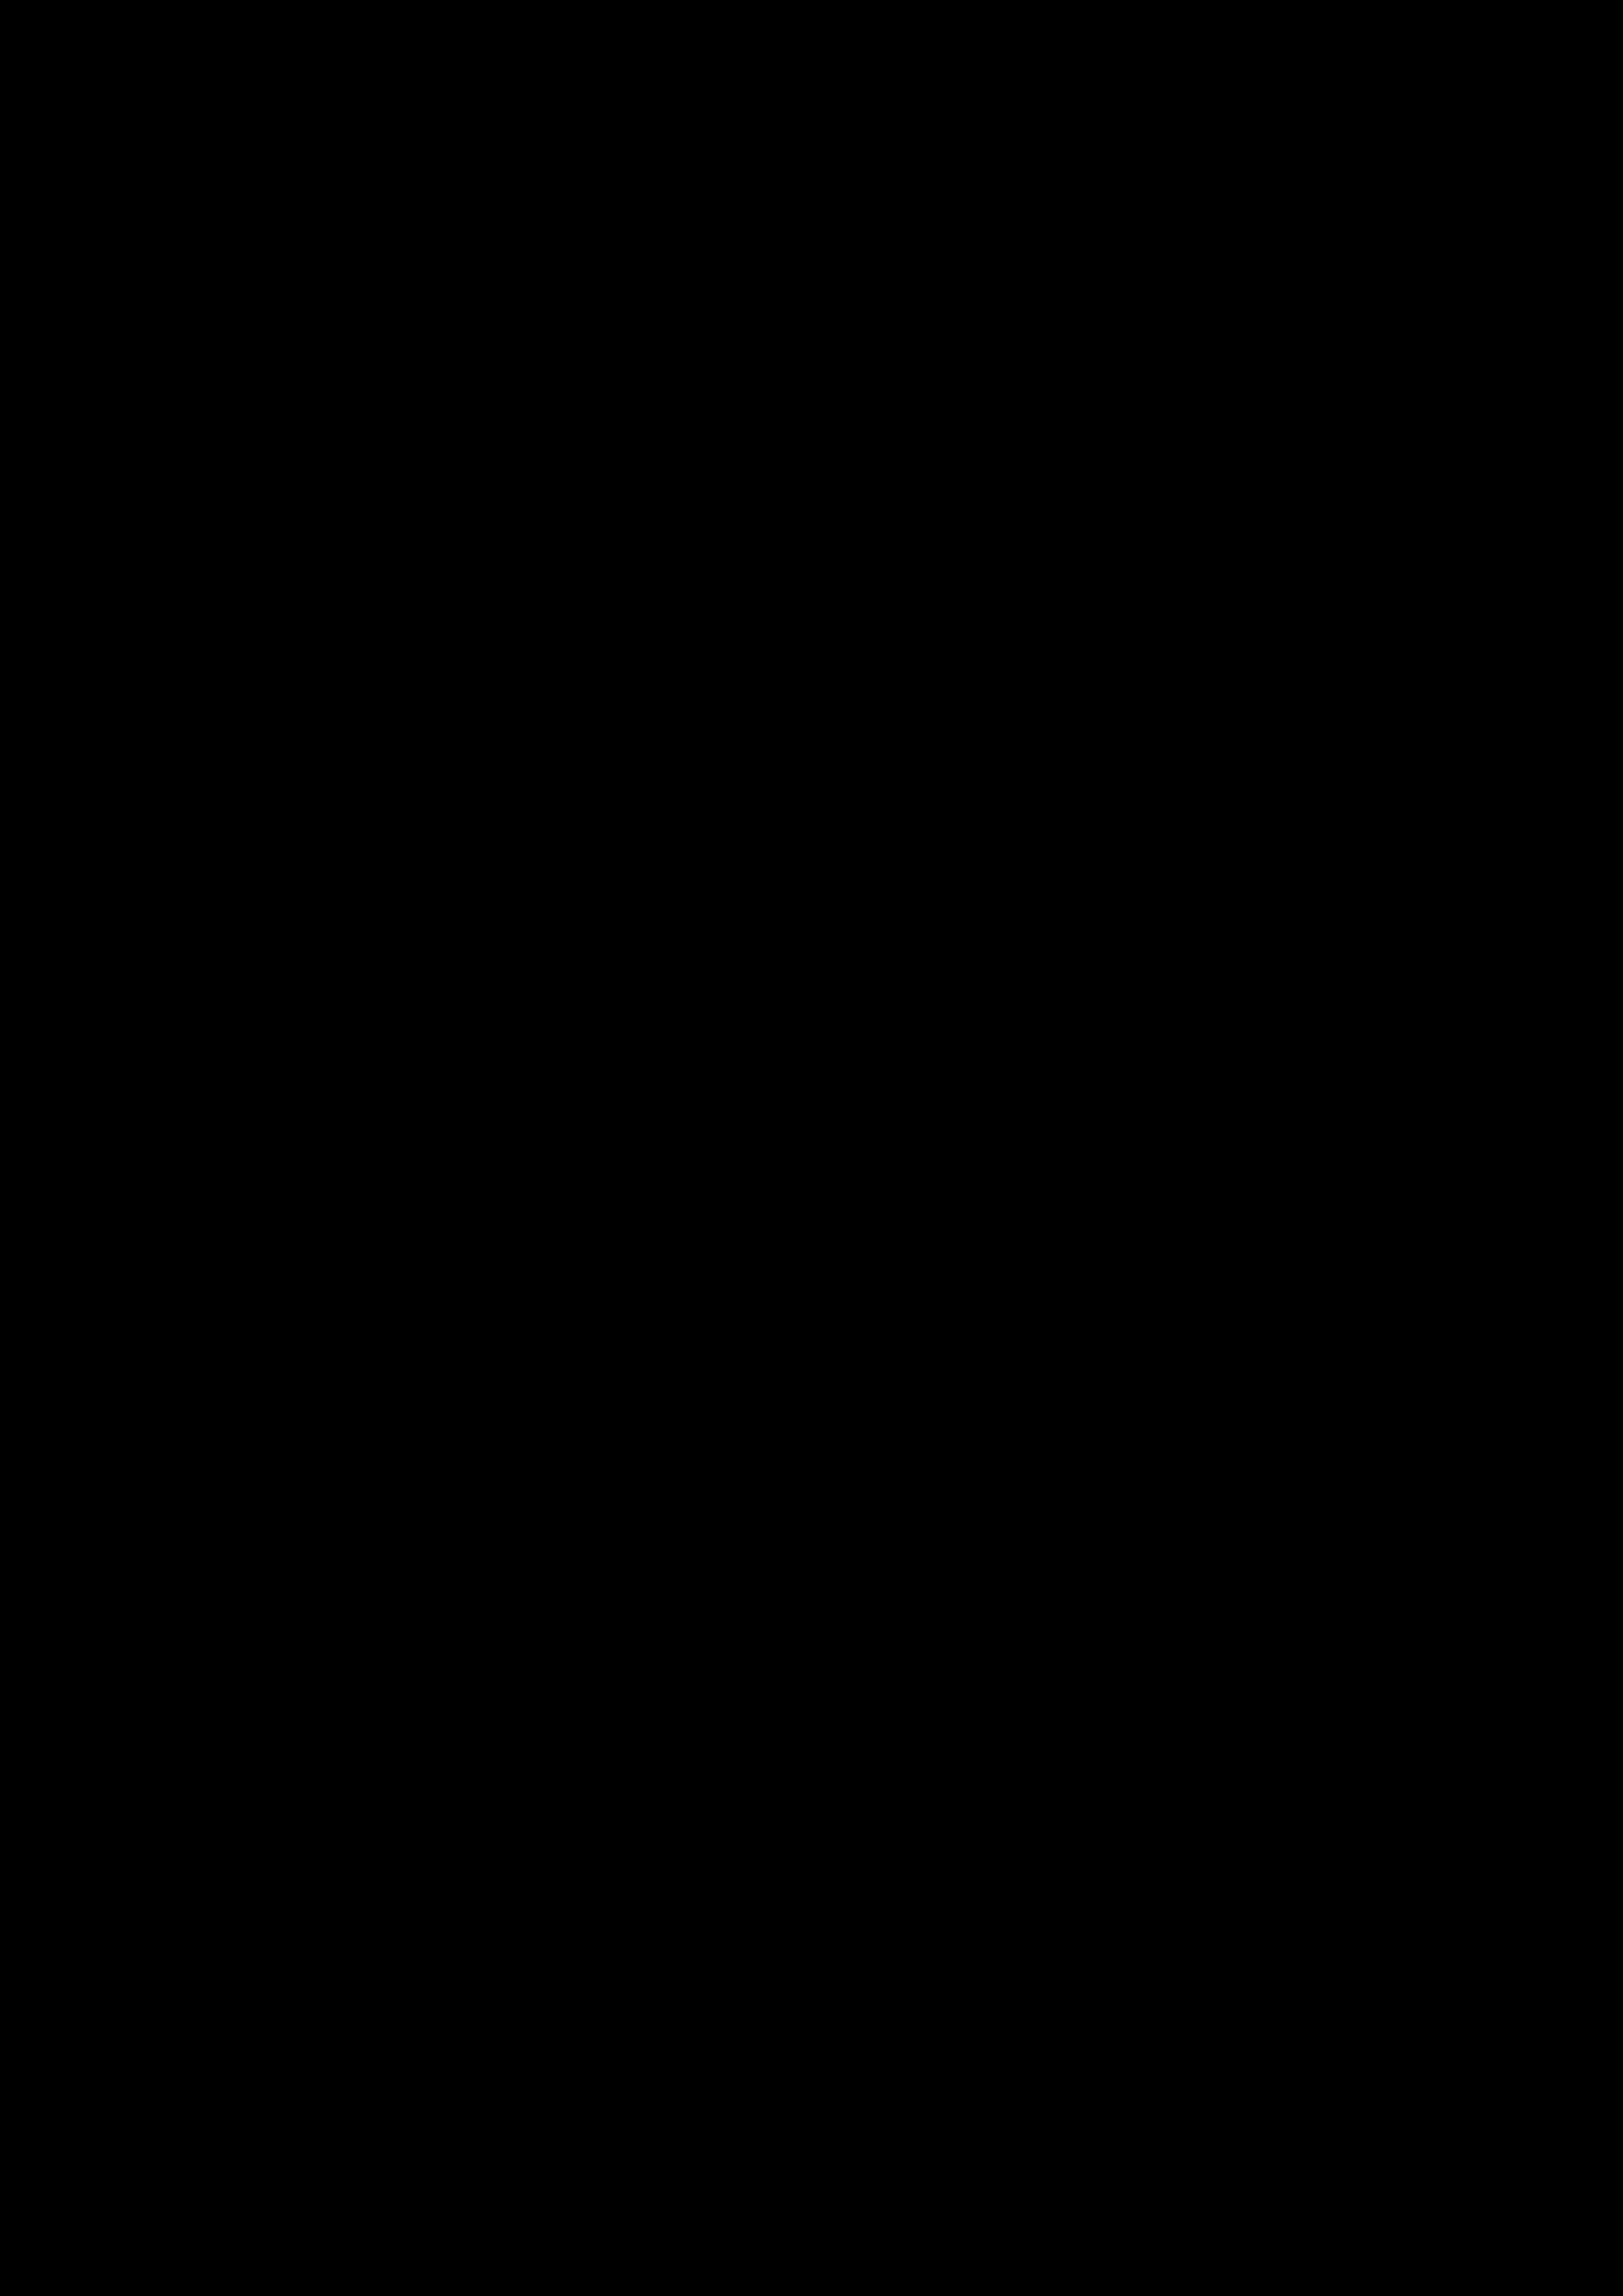 Beautiful line art filigree zodiac symbol. Black sign on vintage  background. Vector clipart.Elegant jewelry tattoo. Scorpio - Buy this stock  vector and explore similar vectors at Adobe Stock | Adobe Stock